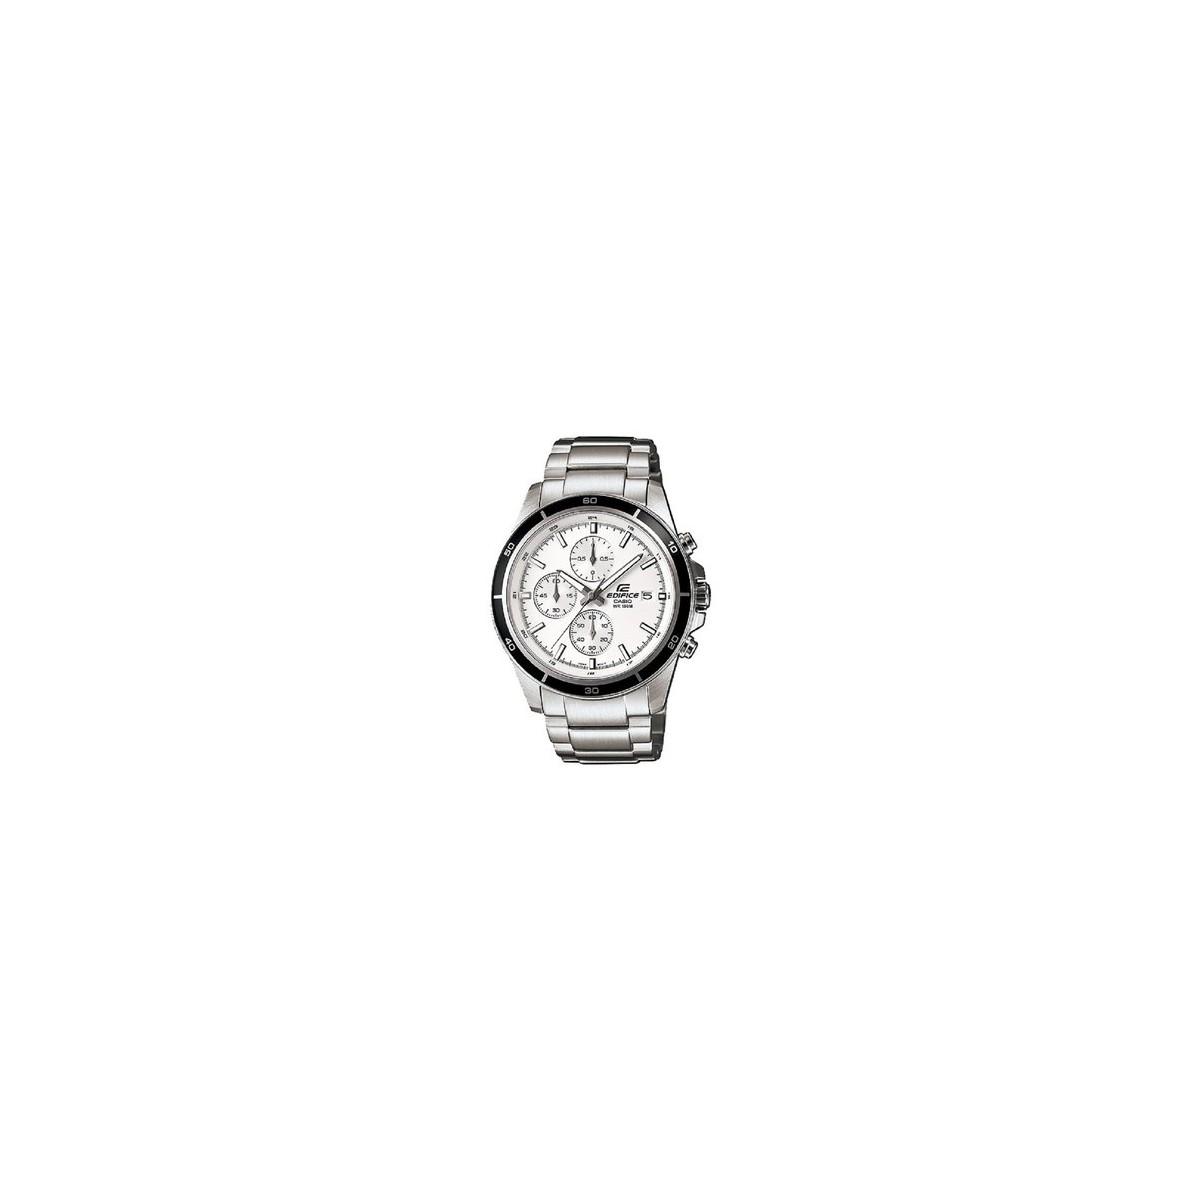 https://www.gaberjoyeria.com/4924-thickbox_default/reloj-casio-edifice.jpg